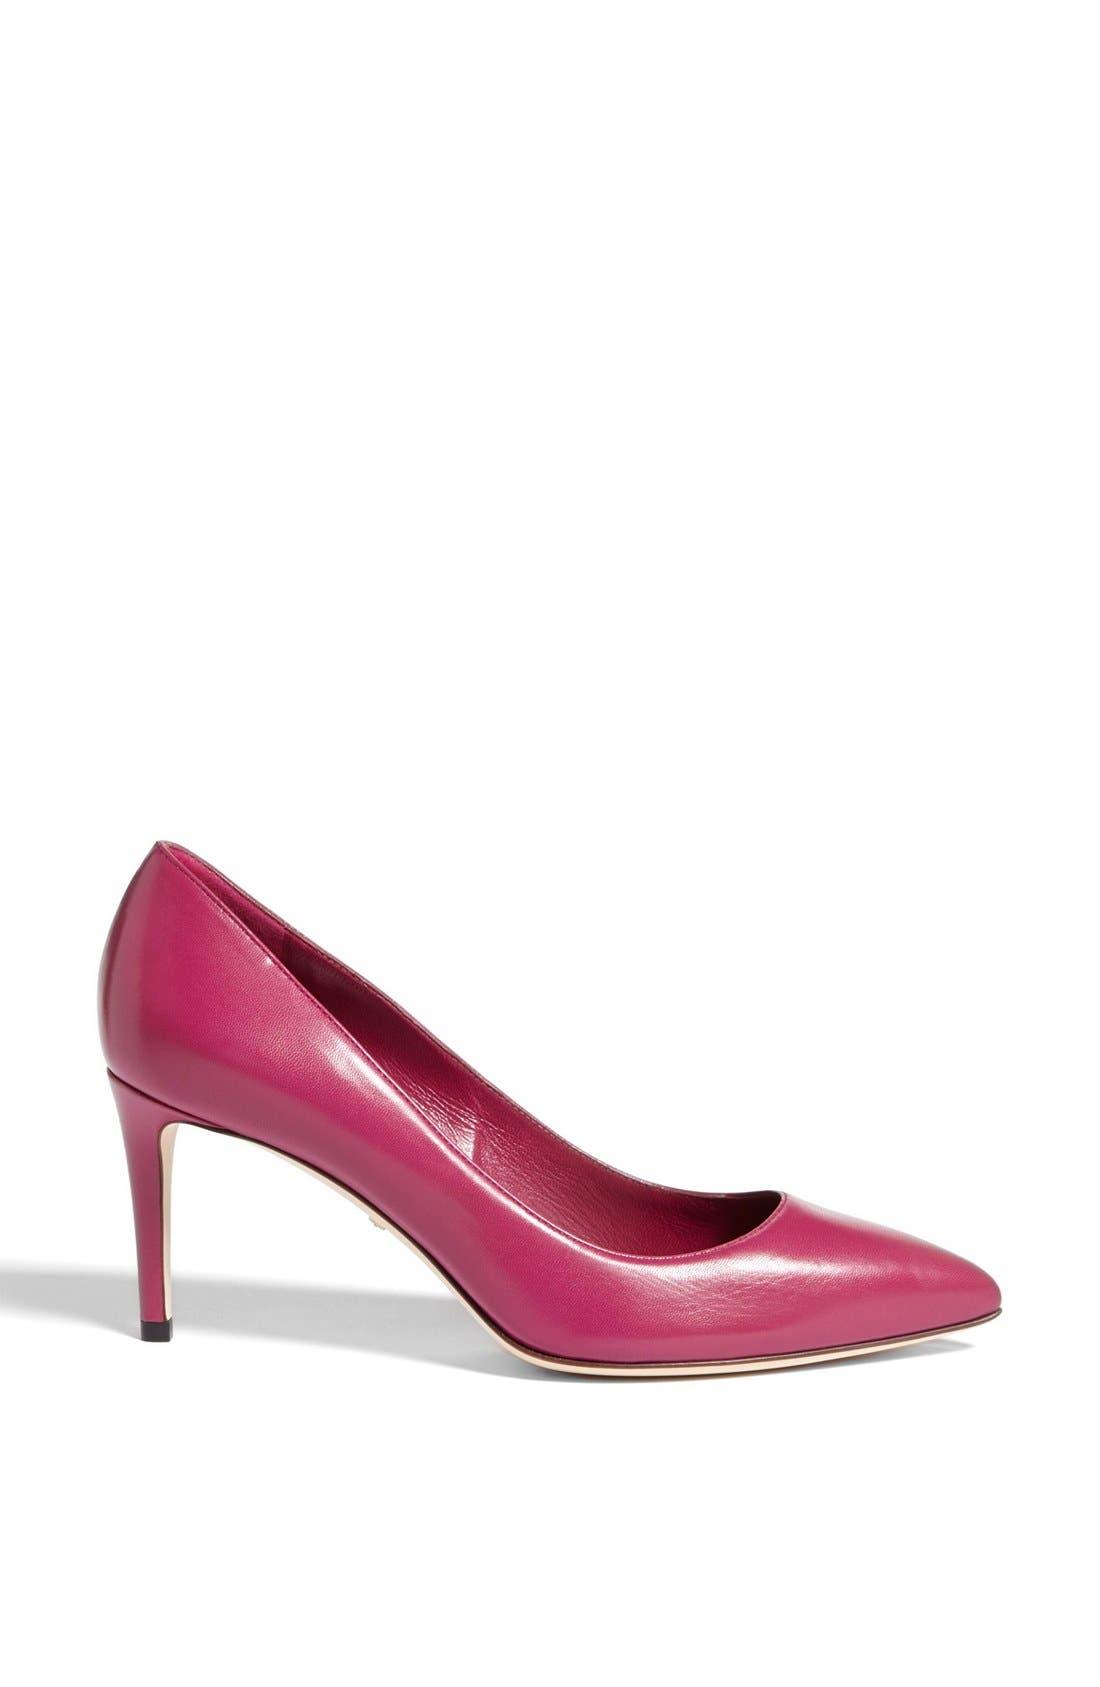 Alternate Image 4  - Gucci 'Brooke' Pointed Toe Pump